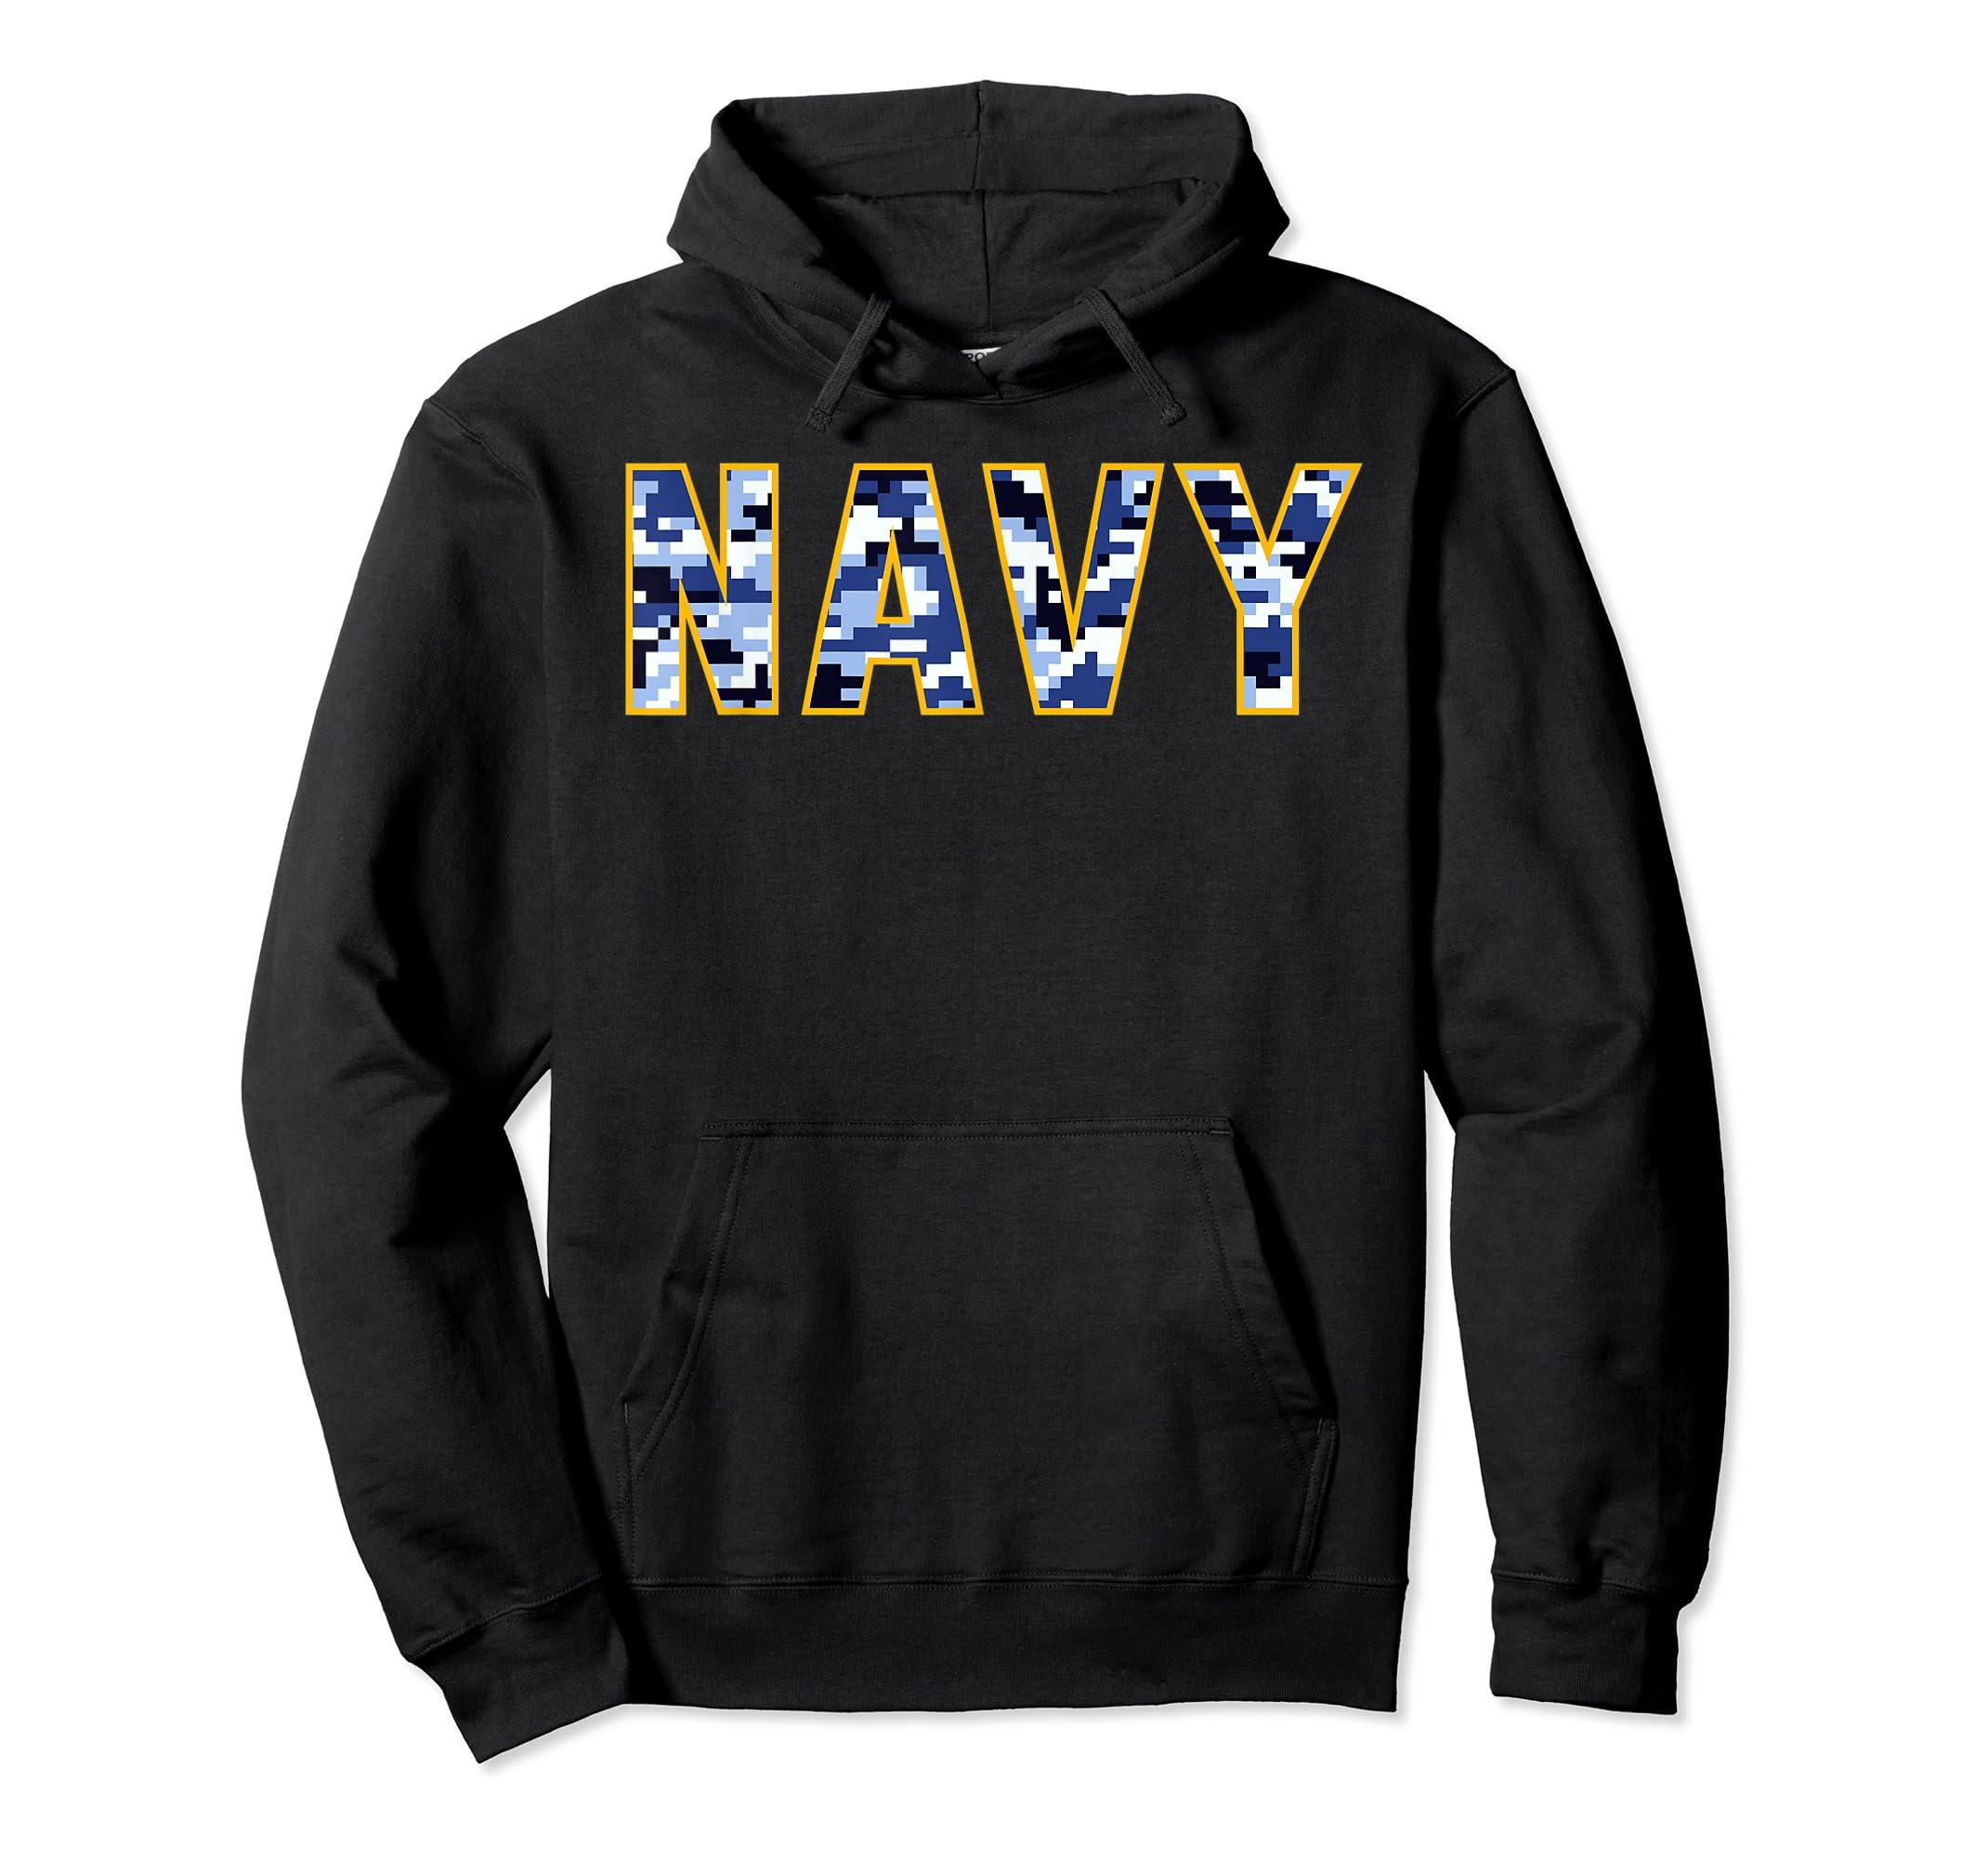 US Navy Camo Shirt Digital Camouflage Tee-Hoodie-Black